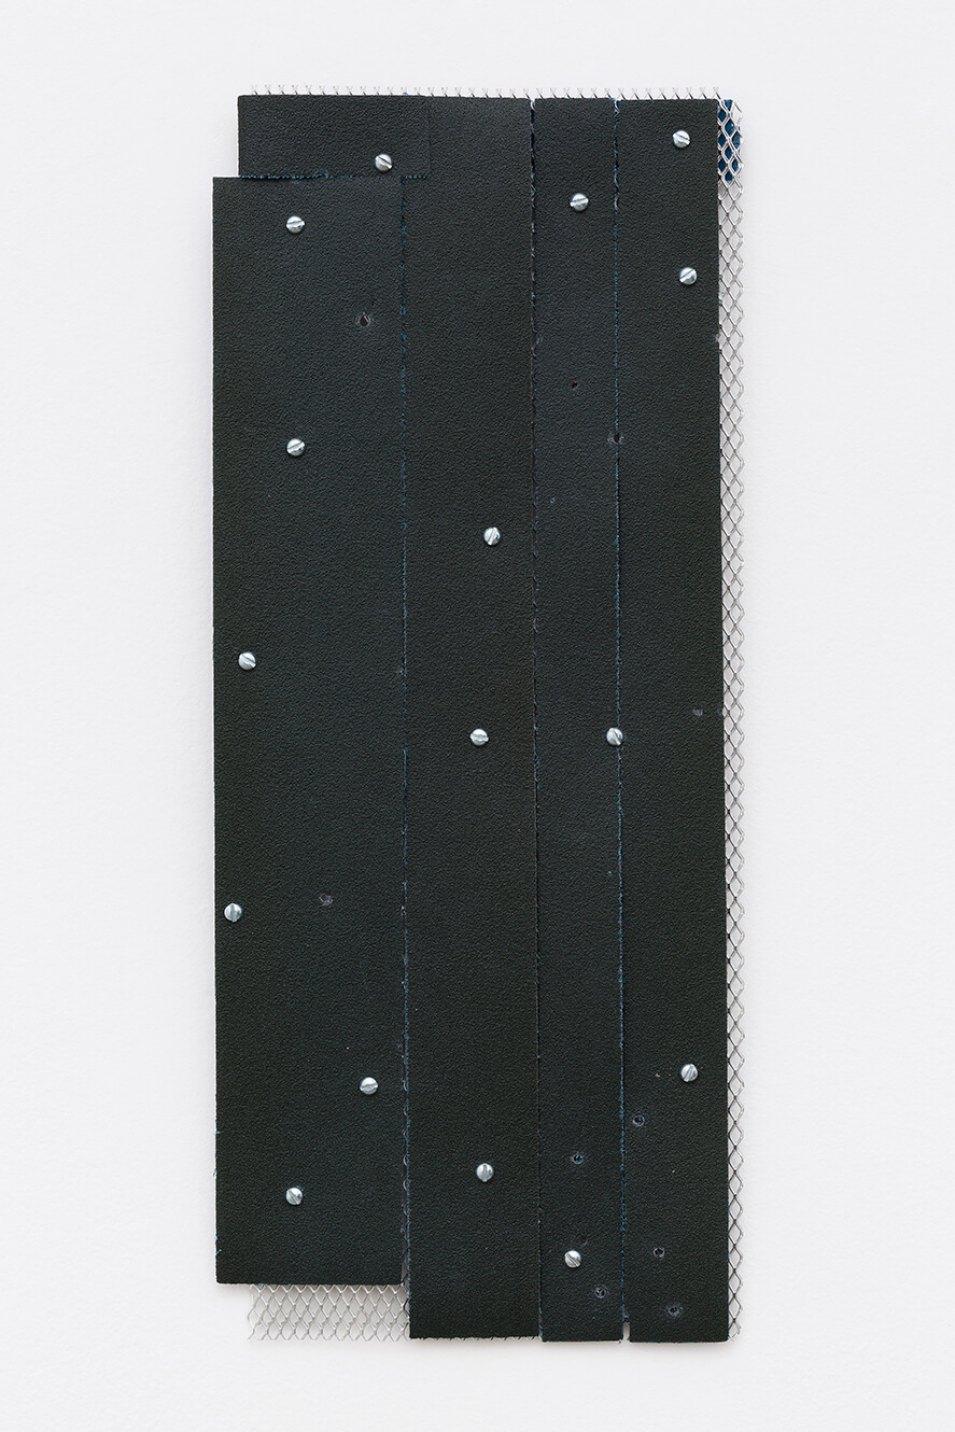 Alessandro Carano,<em>untitled</em>,2017,collage: sandpaper, grid of aluminum and screw, 50× 20 cm - Mendes Wood DM